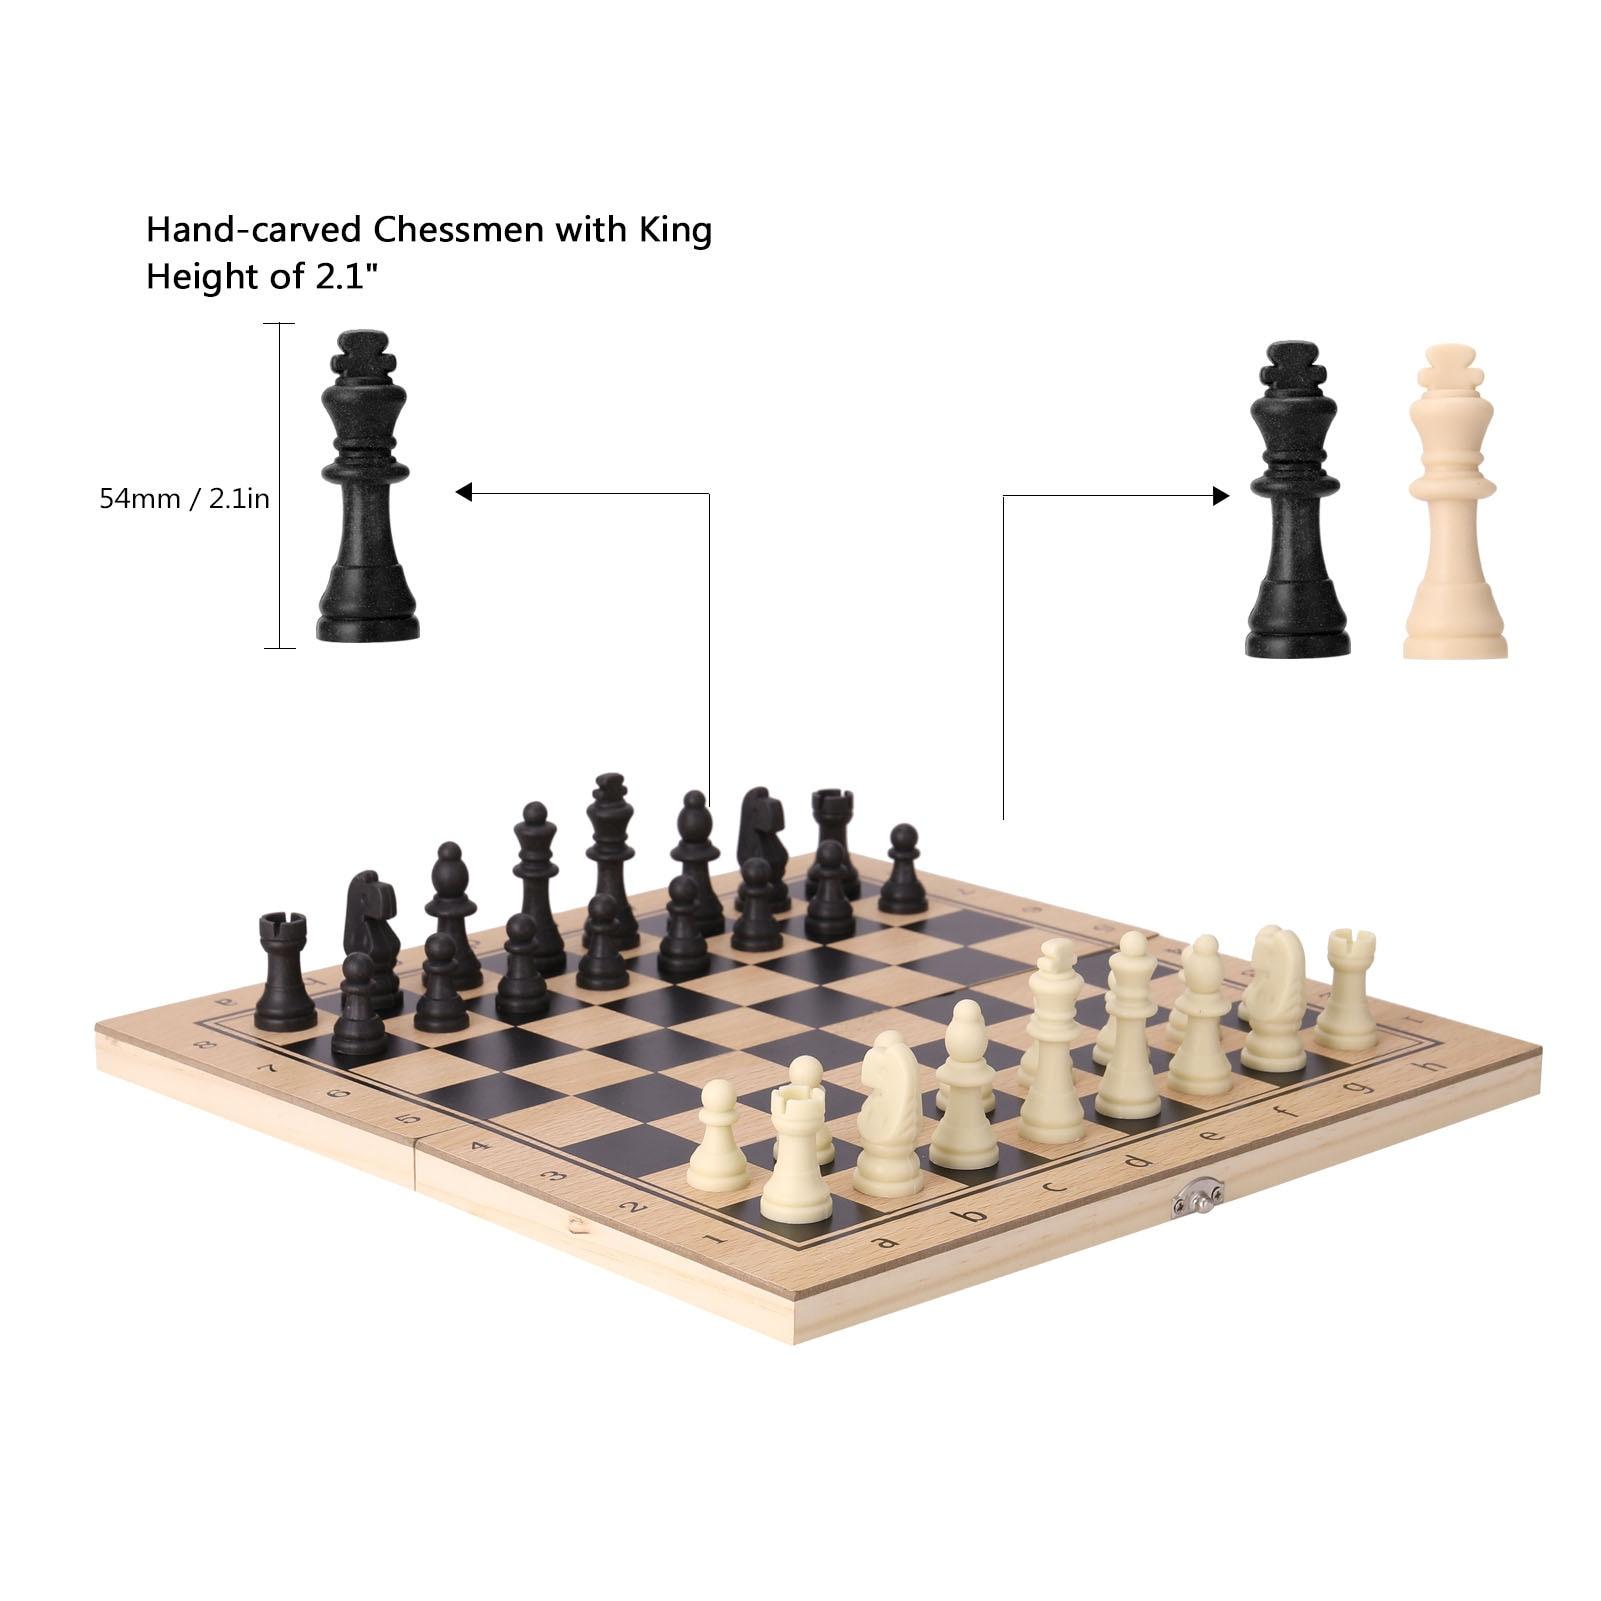 Minimalist Chess Set Wood Classic Chess Set Stone International Chess Party Games Tabuleiro De Xadrez Chess Games BG50CG